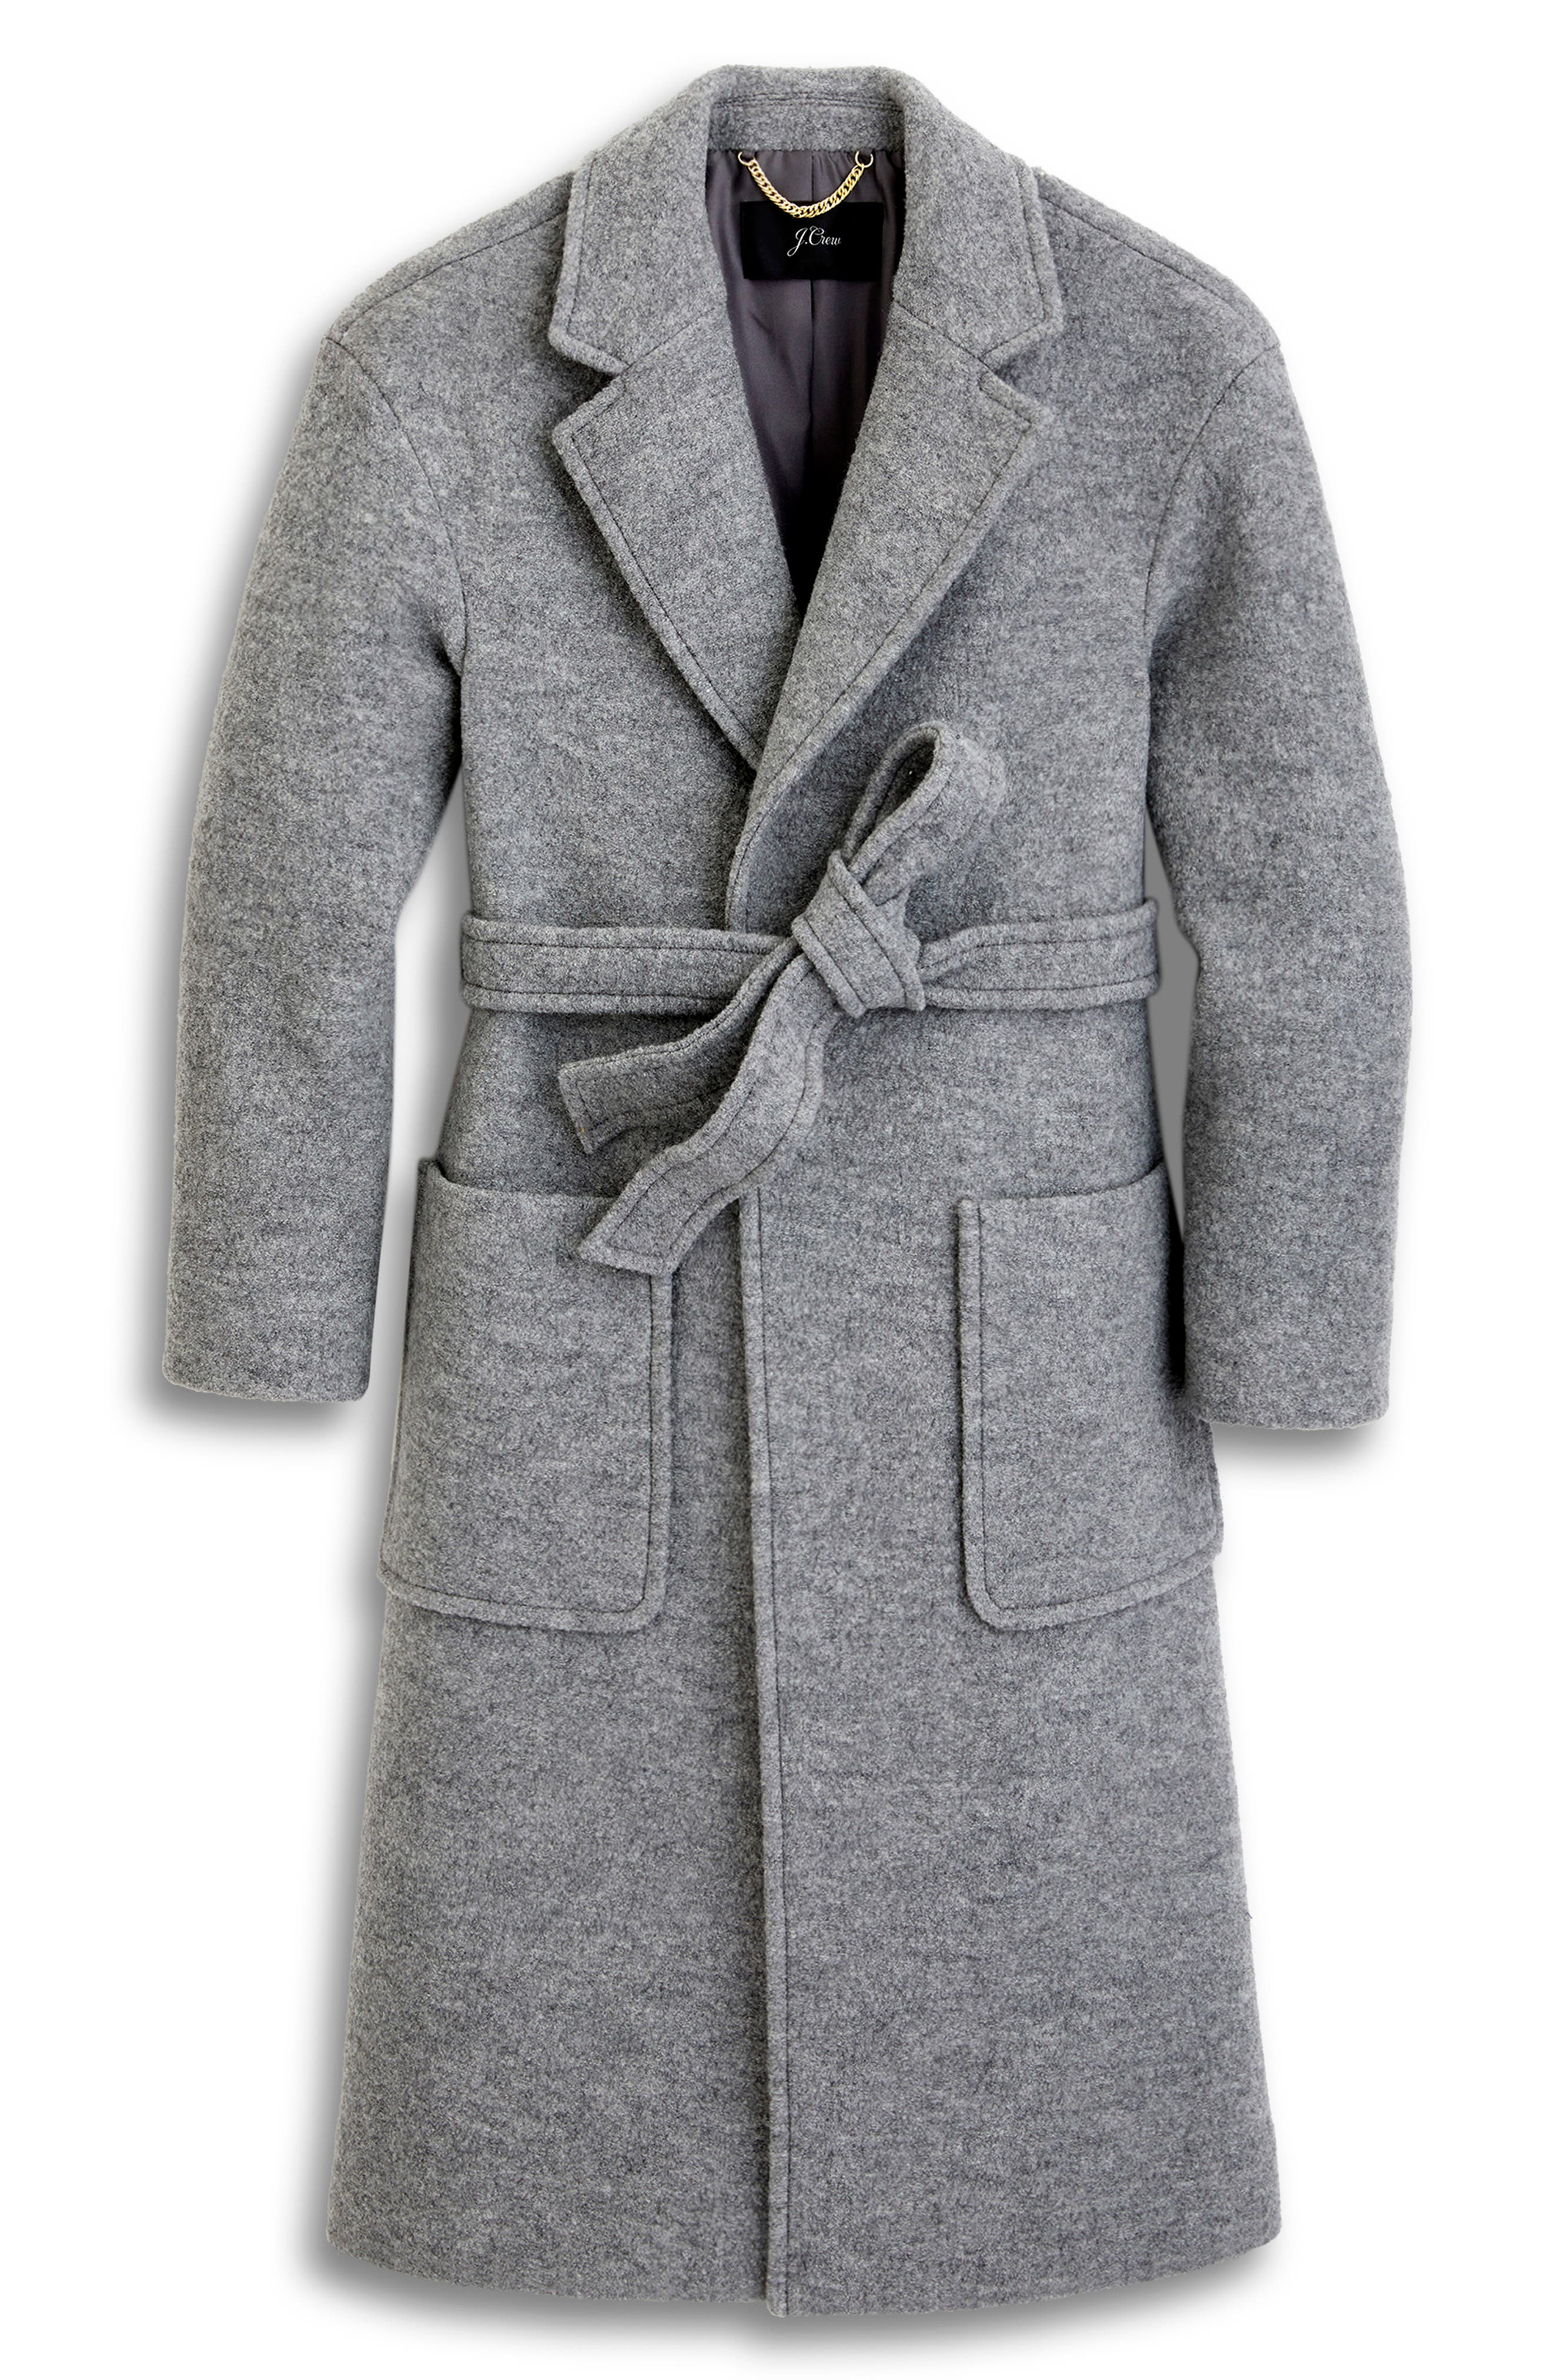 Long Wrap Coat in Italian Boiled Wool,                             Main thumbnail 1, color,                             SNOWY CEMENT